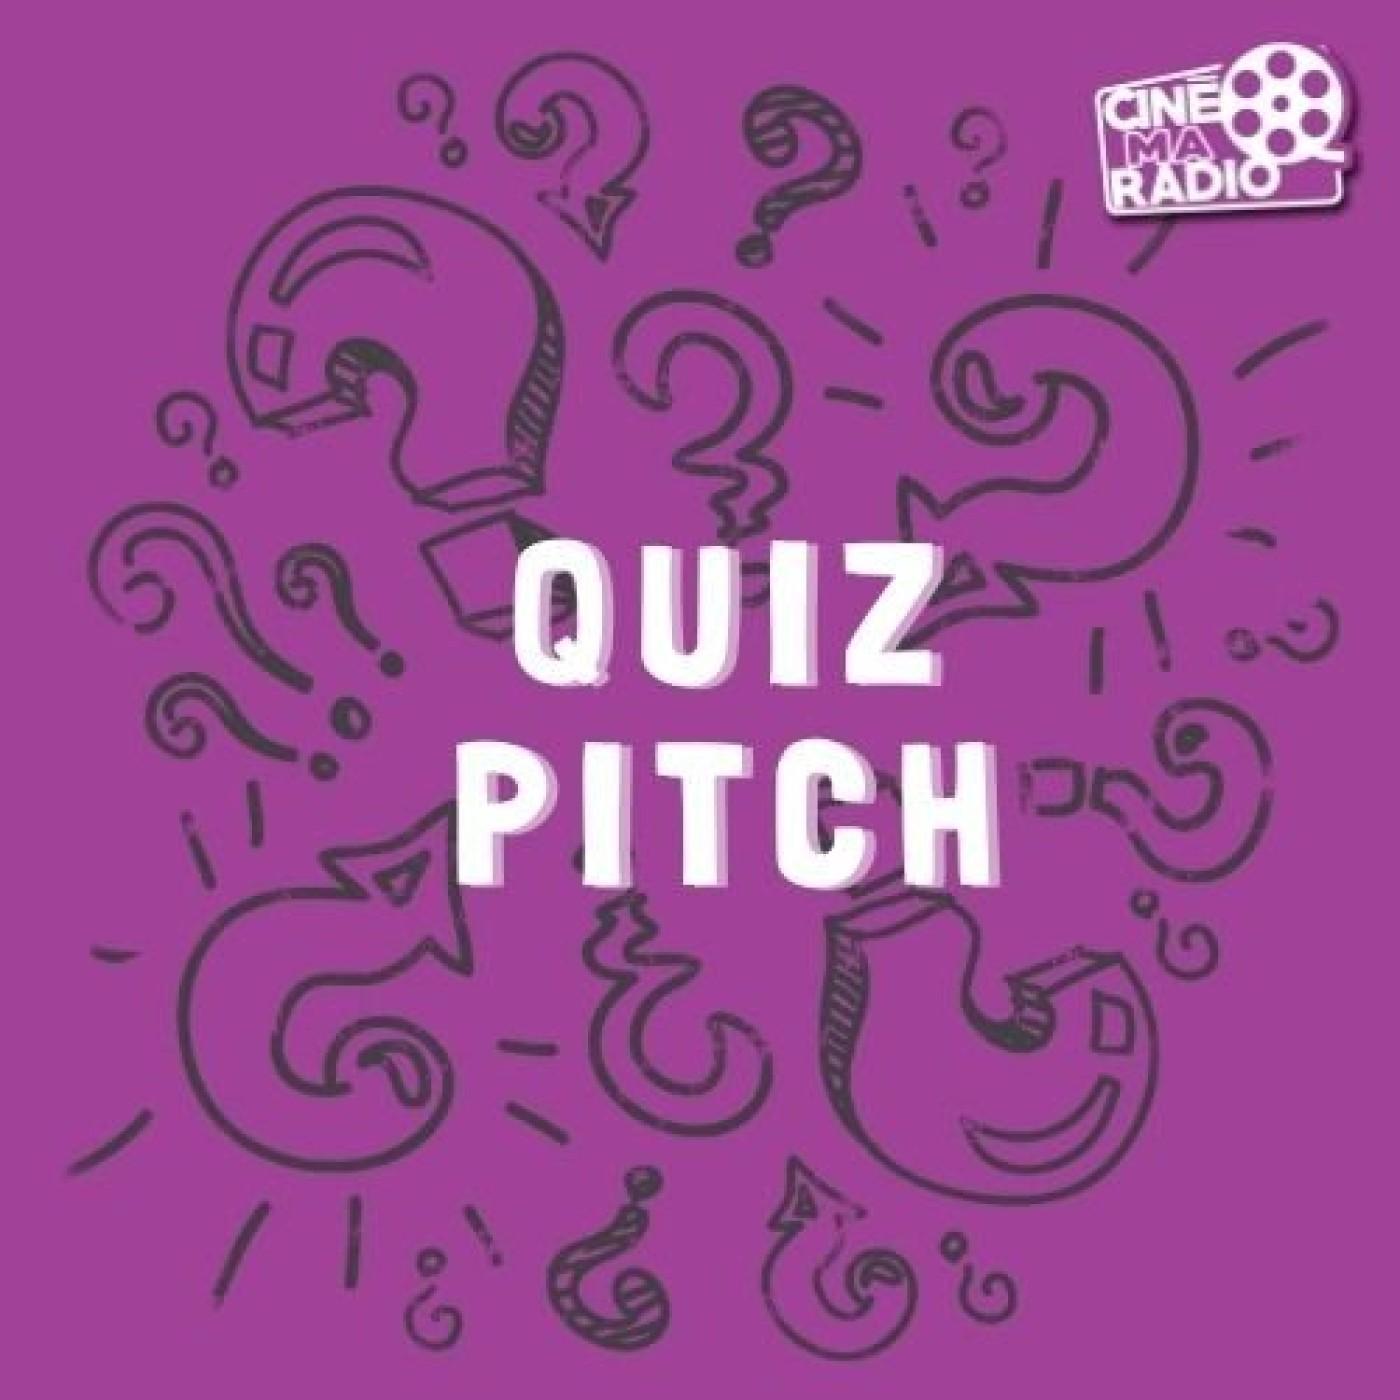 Quiz Pitch Question [Vendredi]